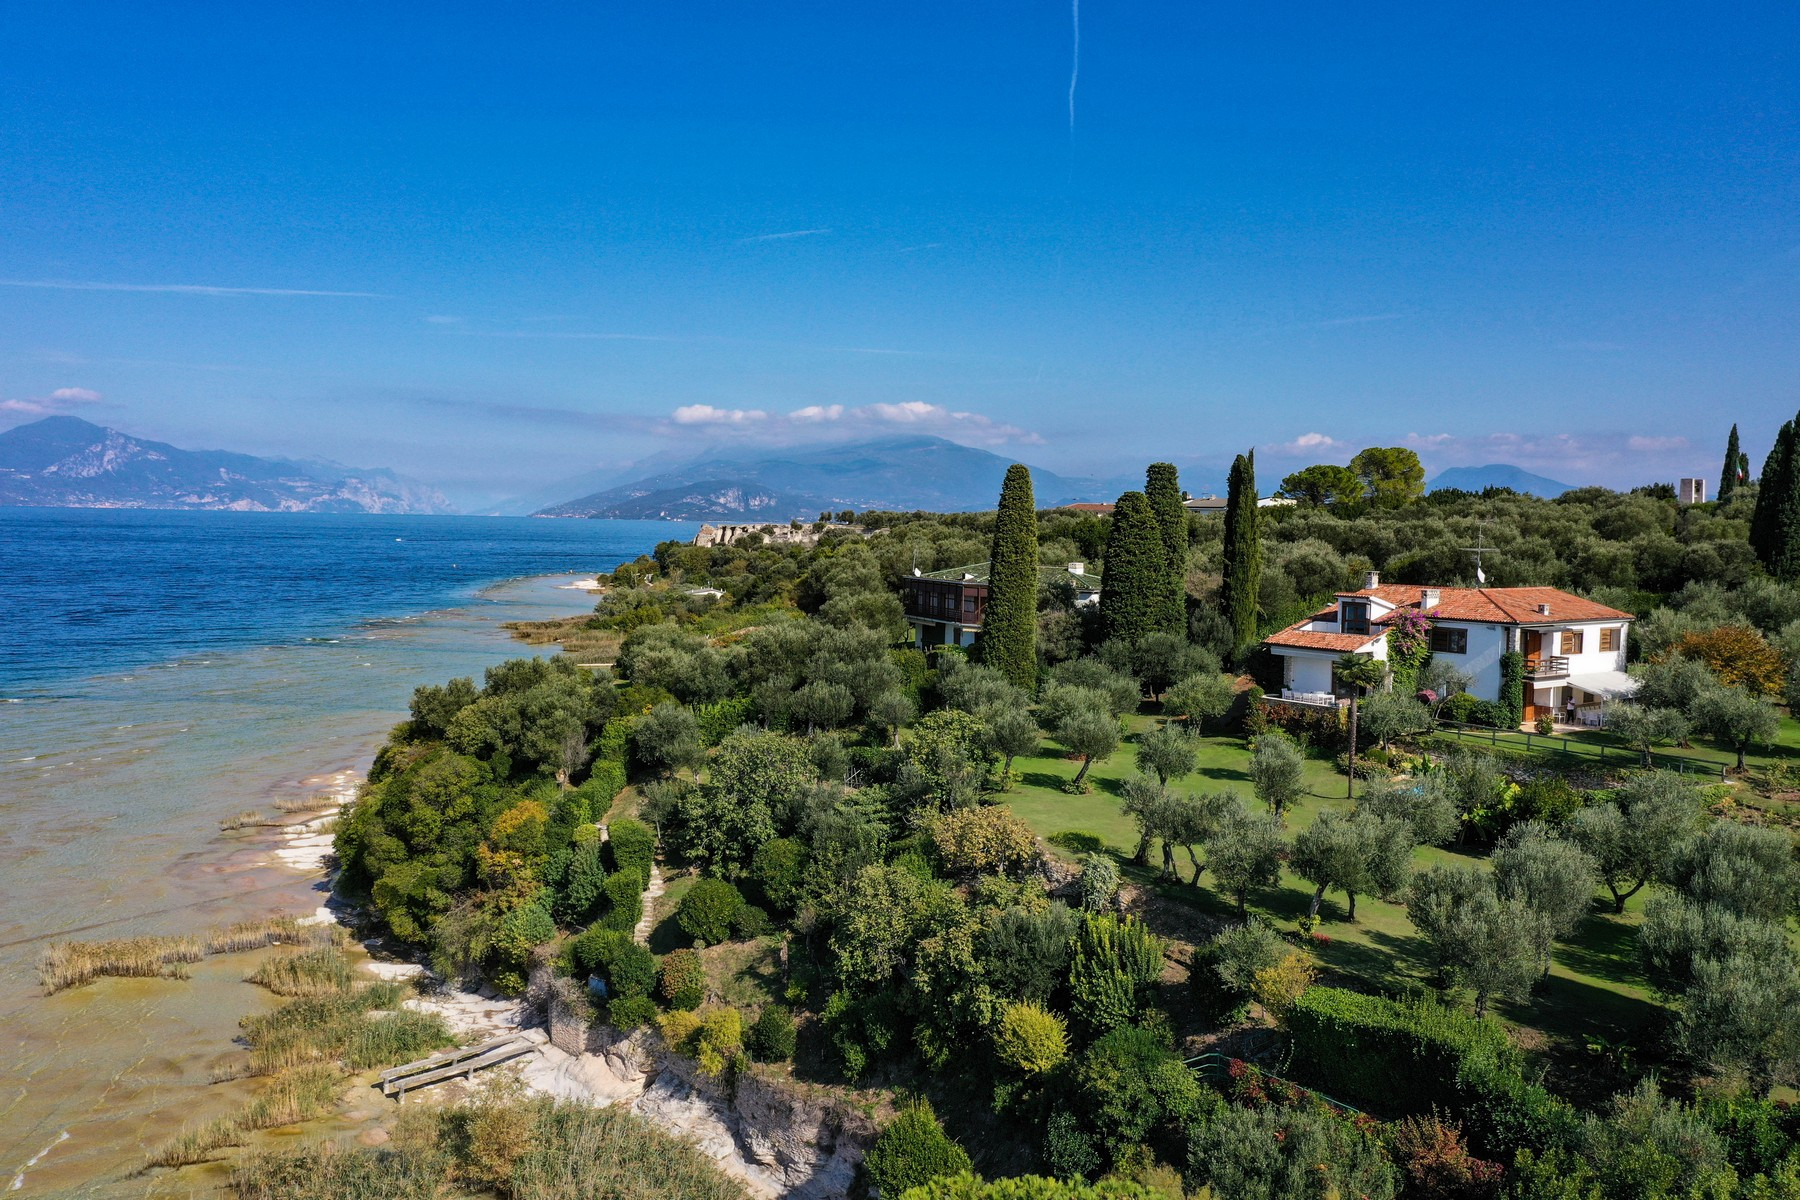 Villa in Vendita a Sirmione: 5 locali, 500 mq - Foto 26